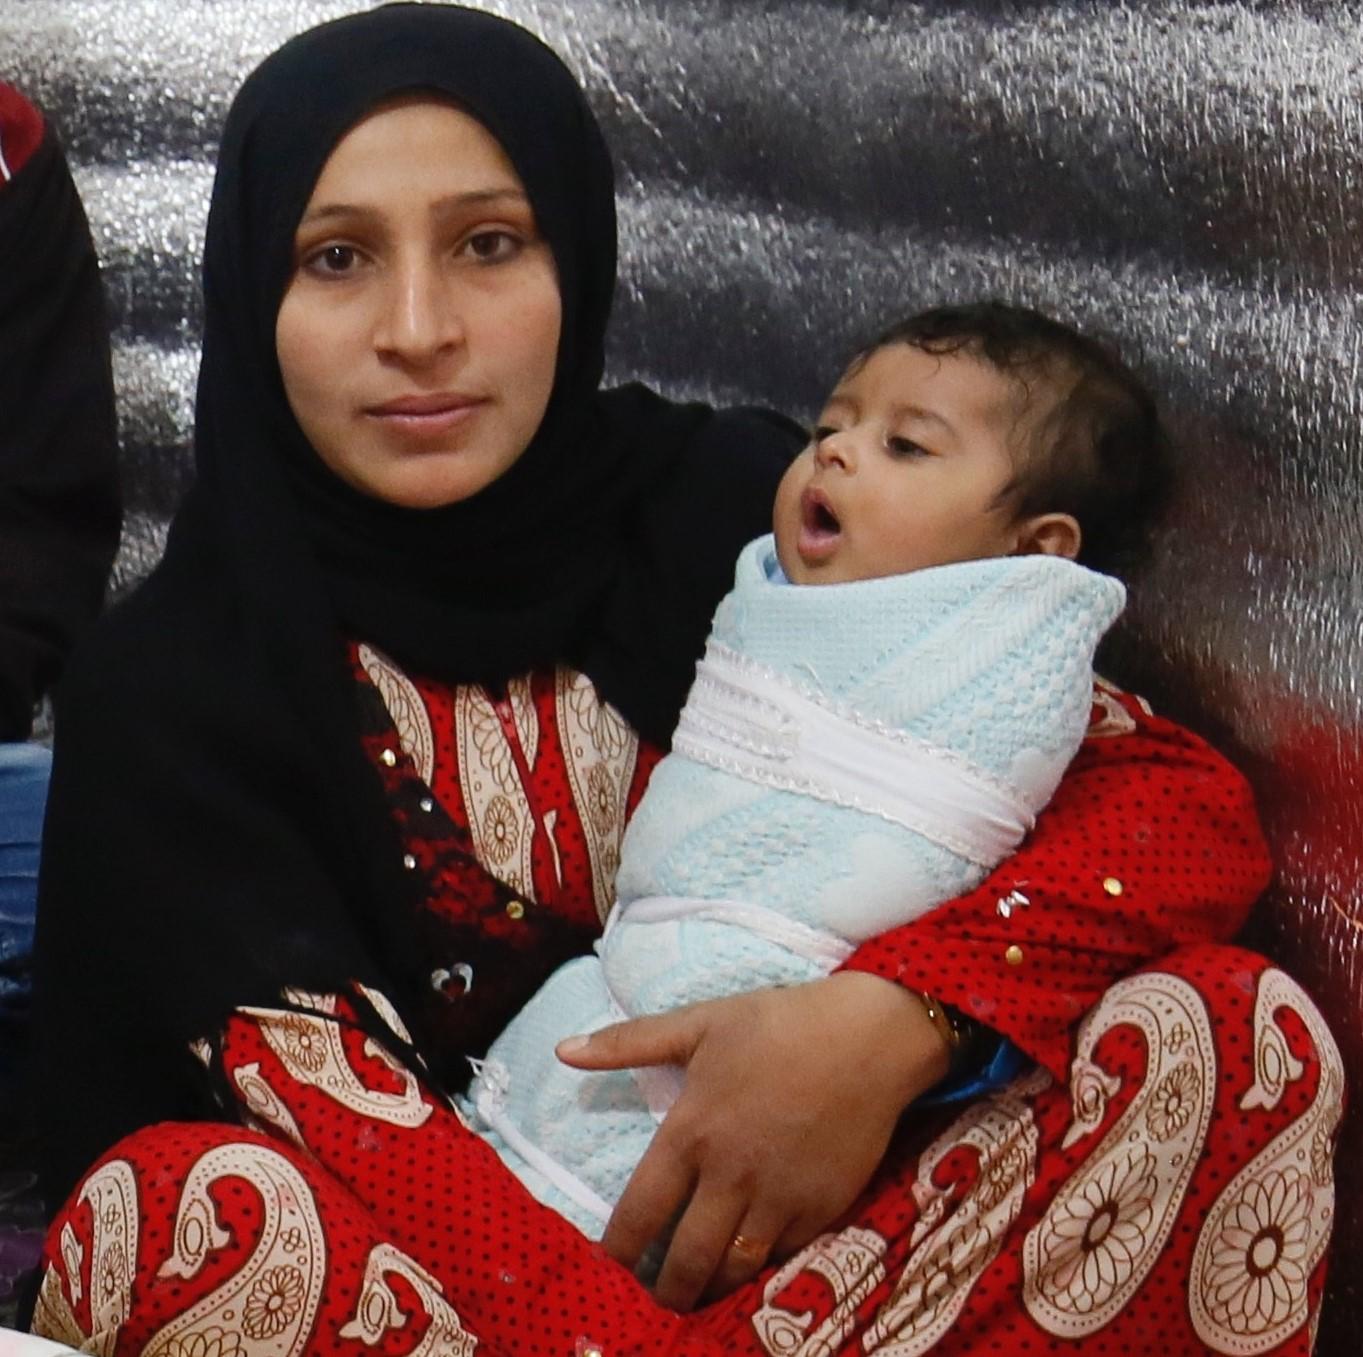 Idlib Bekaa refugees